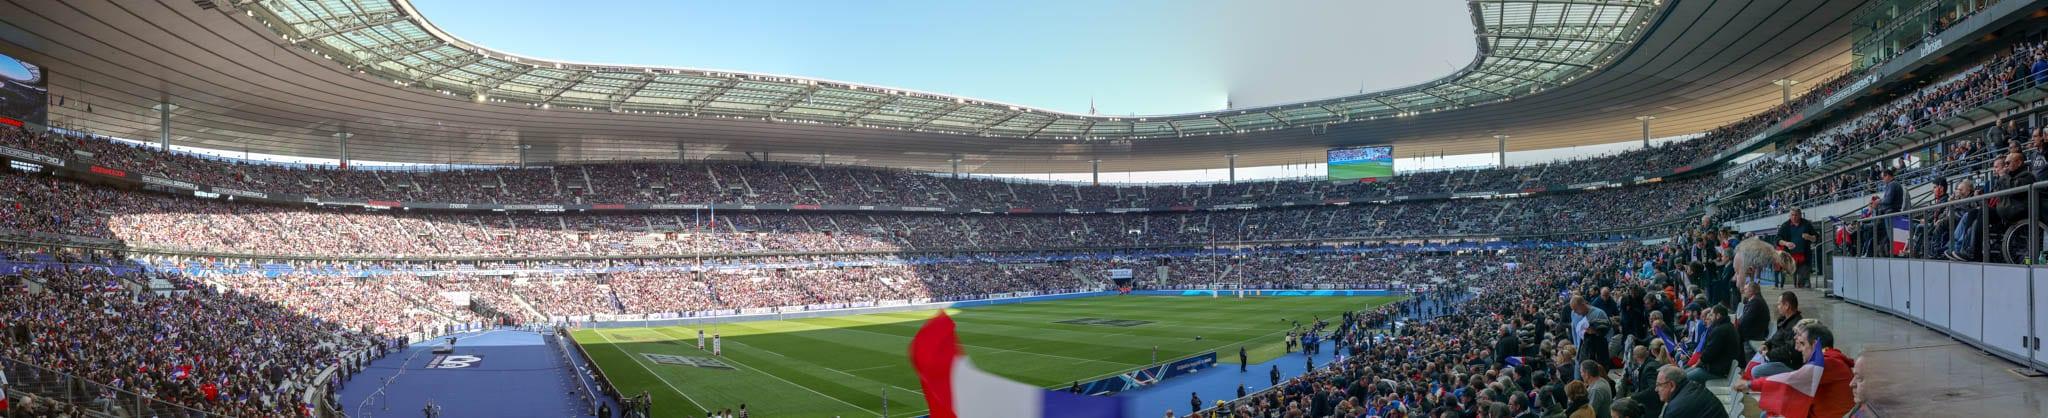 Rugby Paris Feb 2019